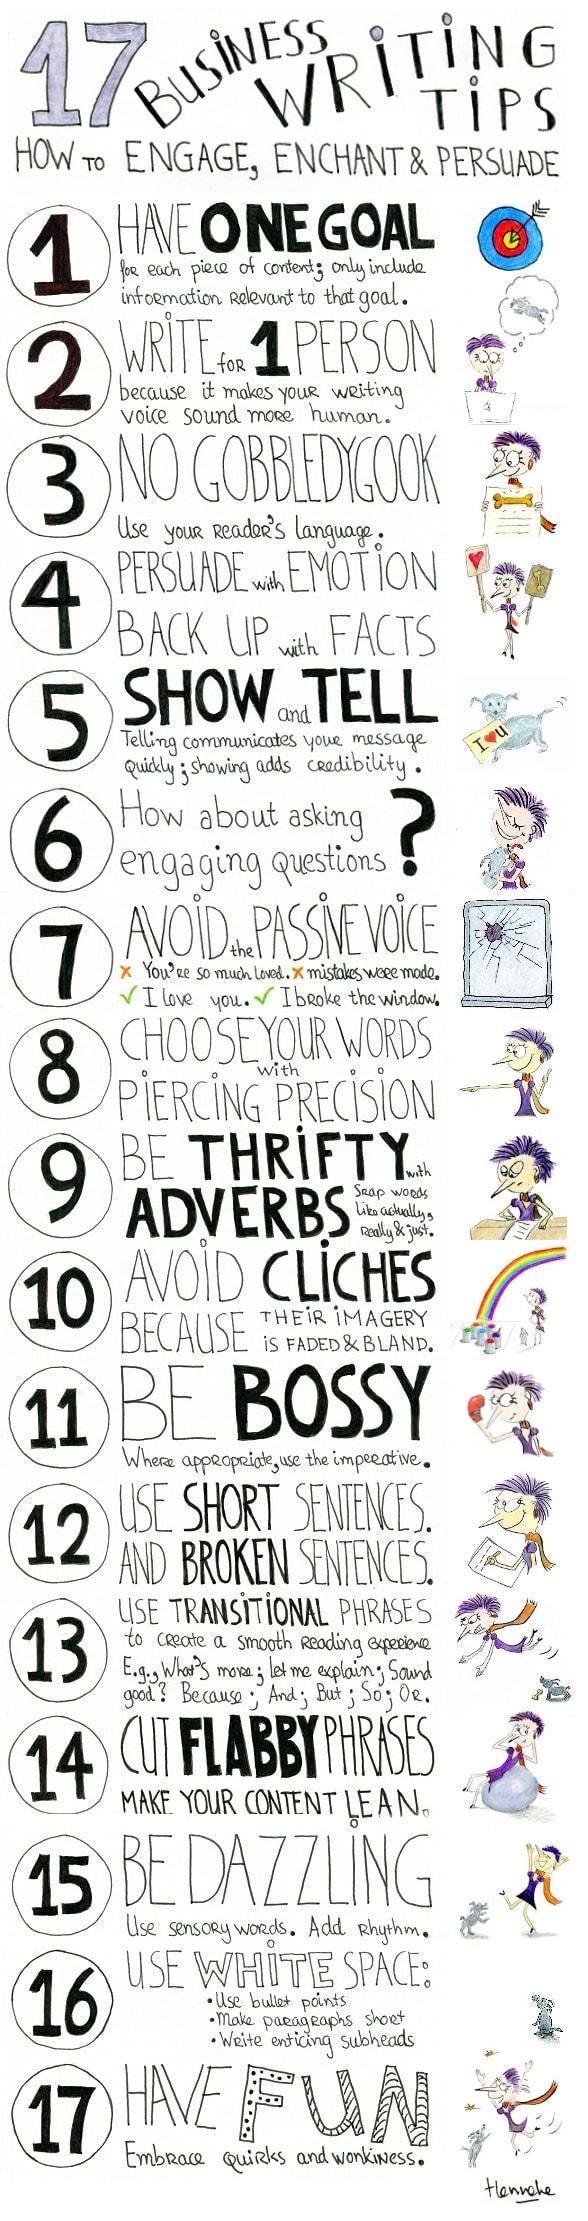 business-writing-tips.jpg